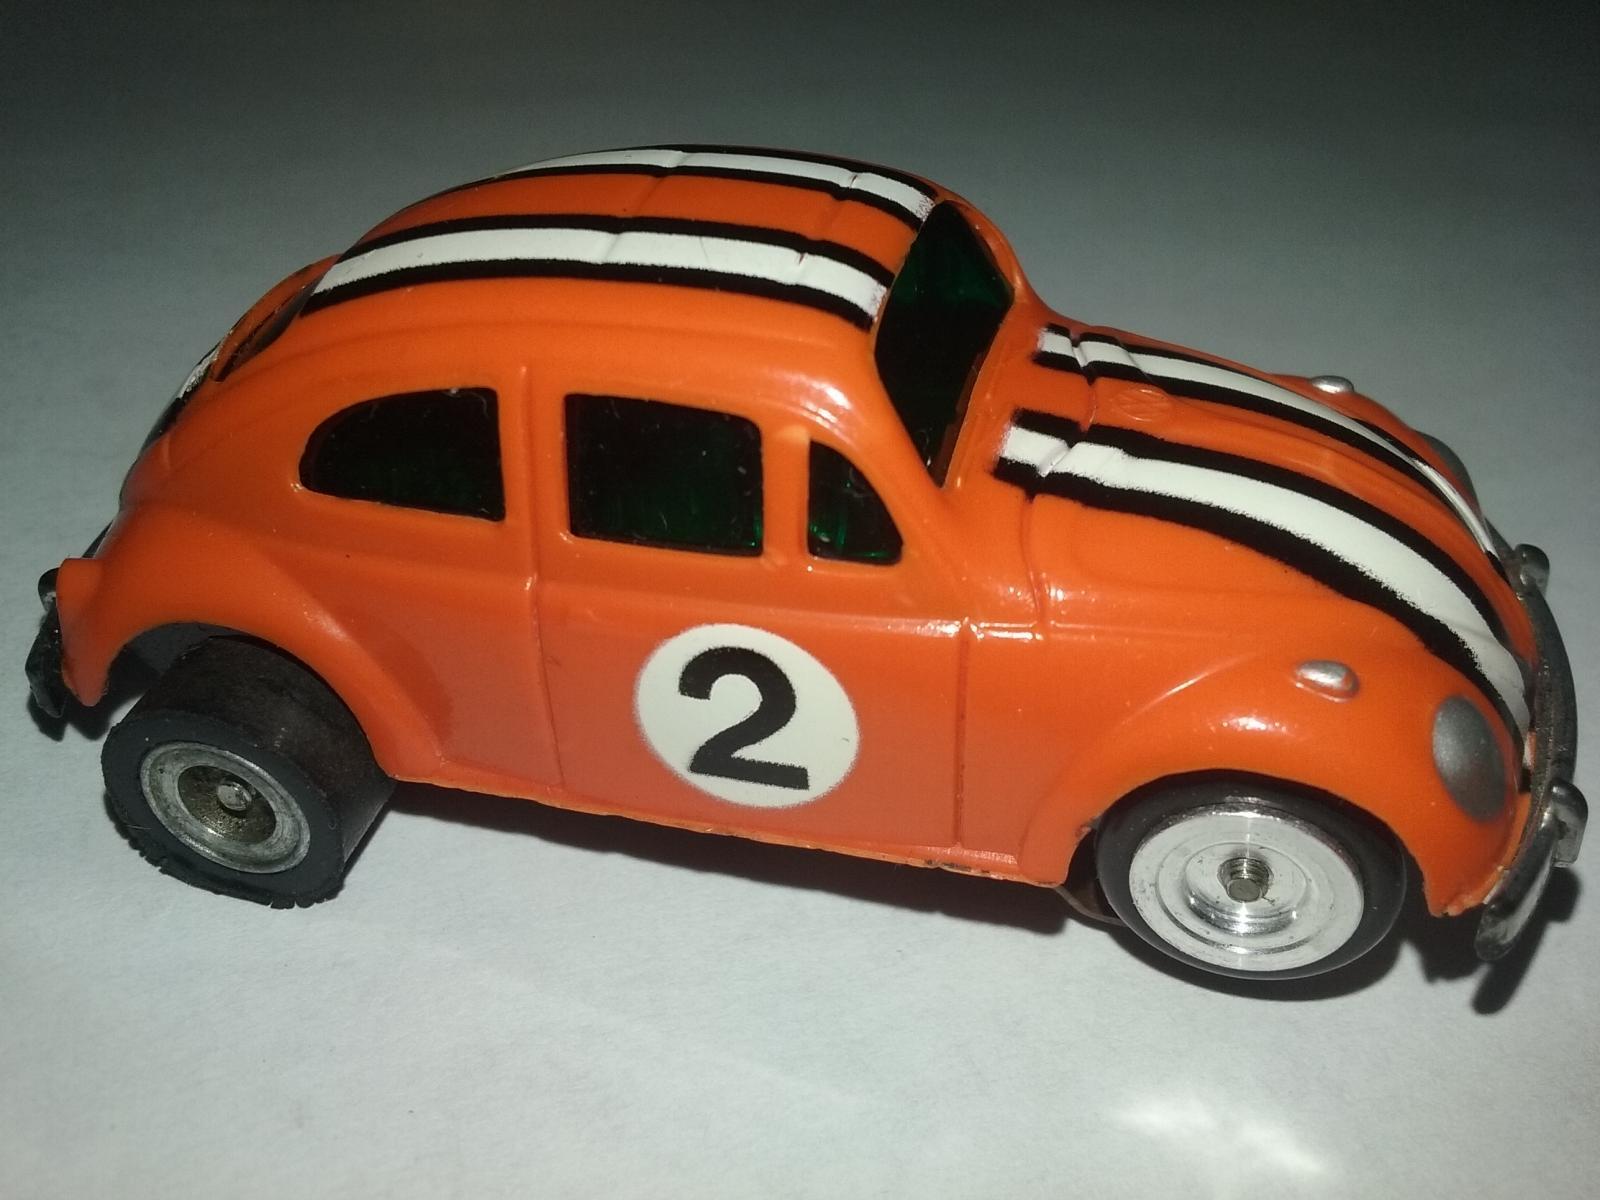 AURORA Model Motoring VW Sedan Slot Car